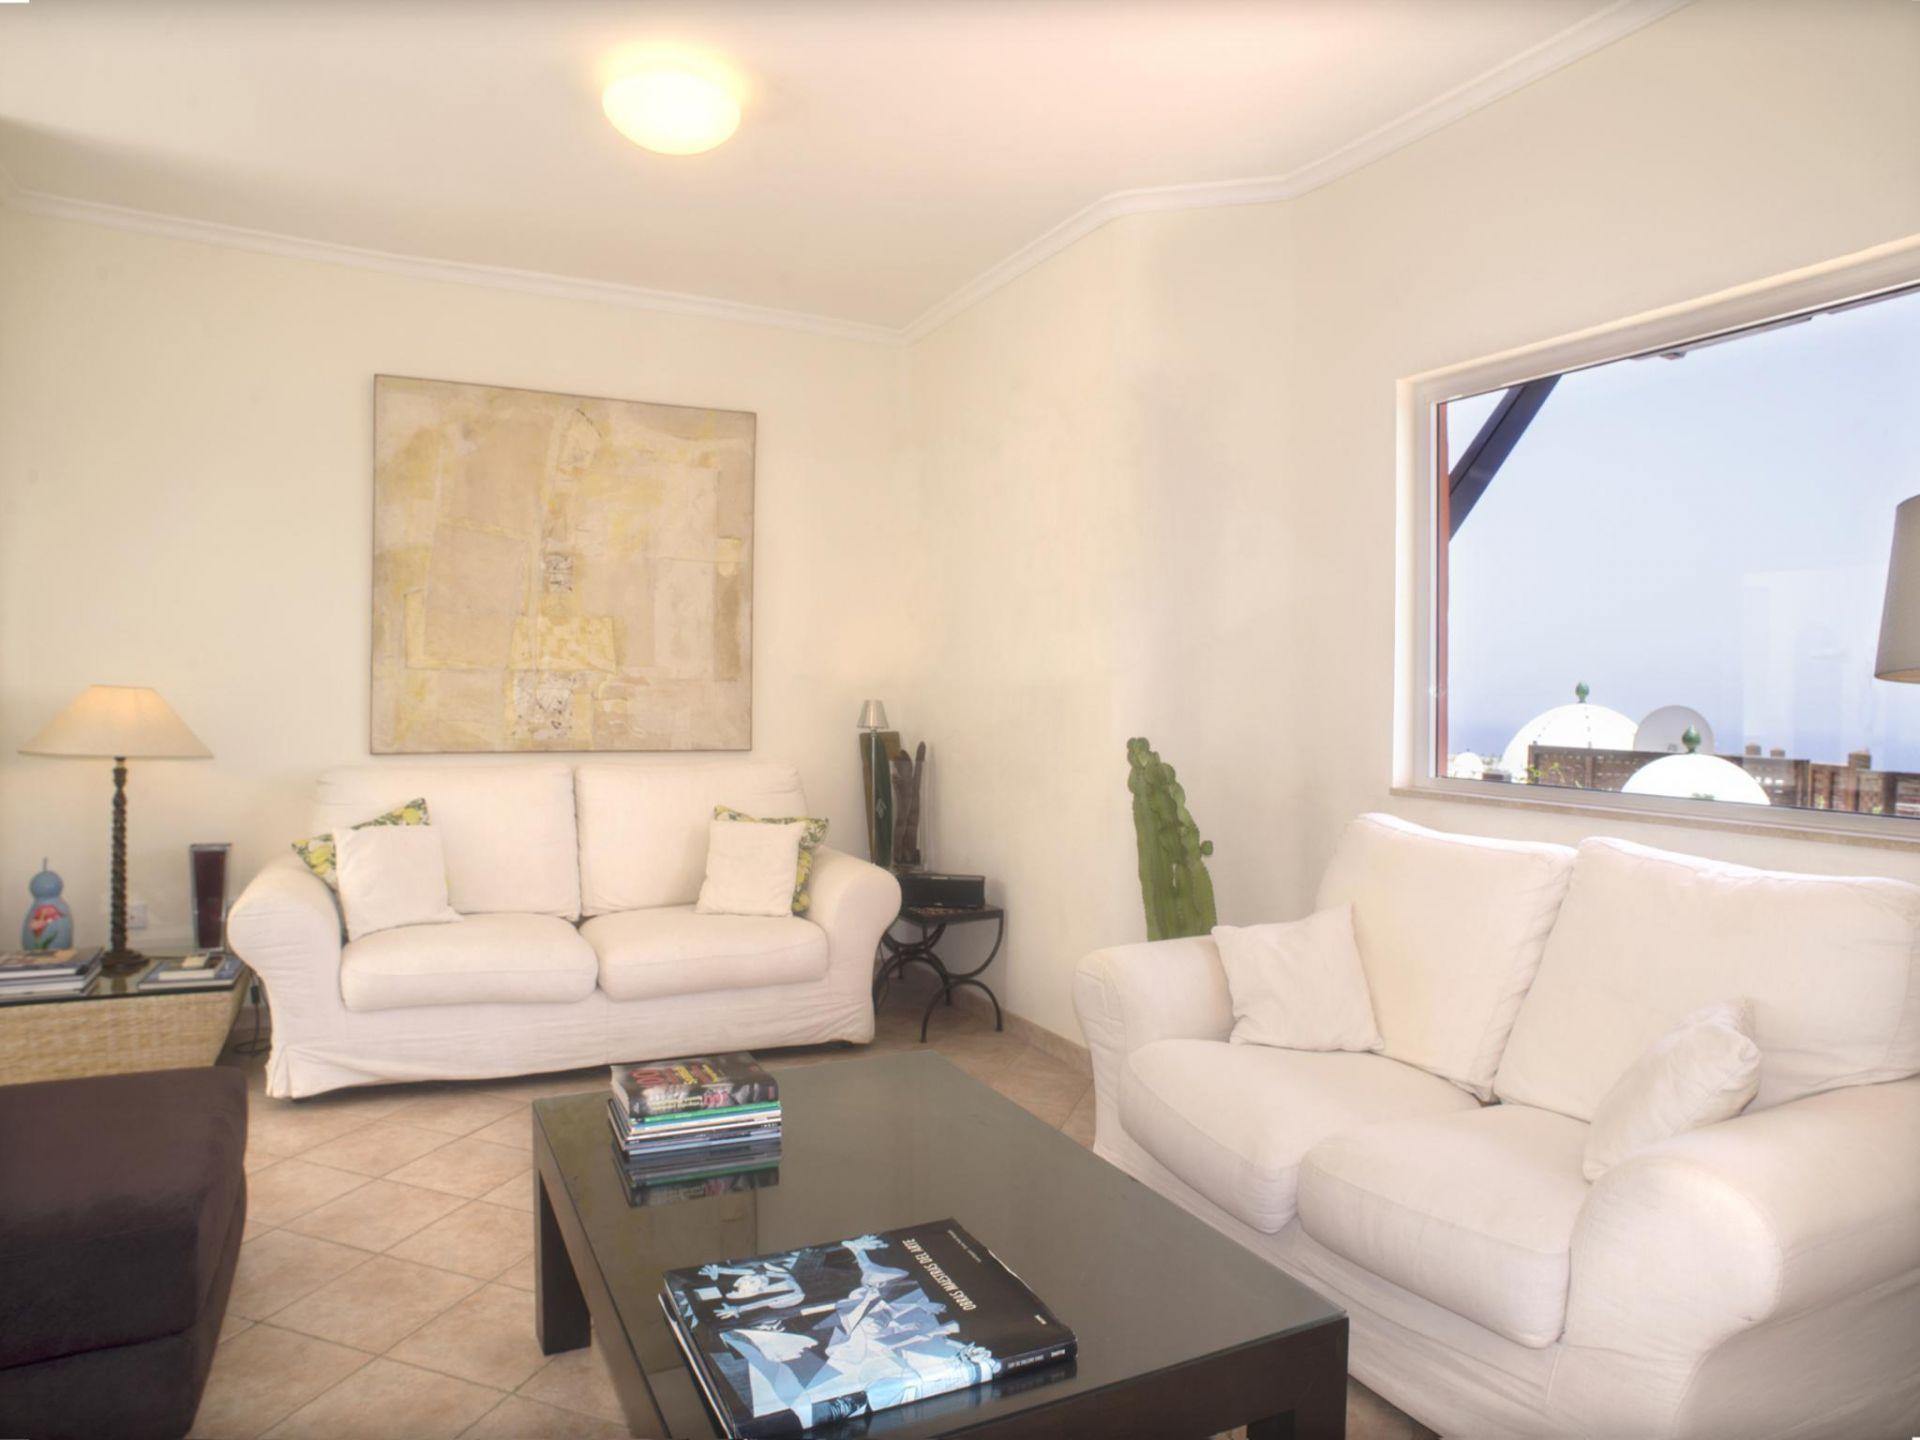 Holiday apartment Villa San Agustin 10 - Holiday Rental (854295), Maspalomas, Gran Canaria, Canary Islands, Spain, picture 11